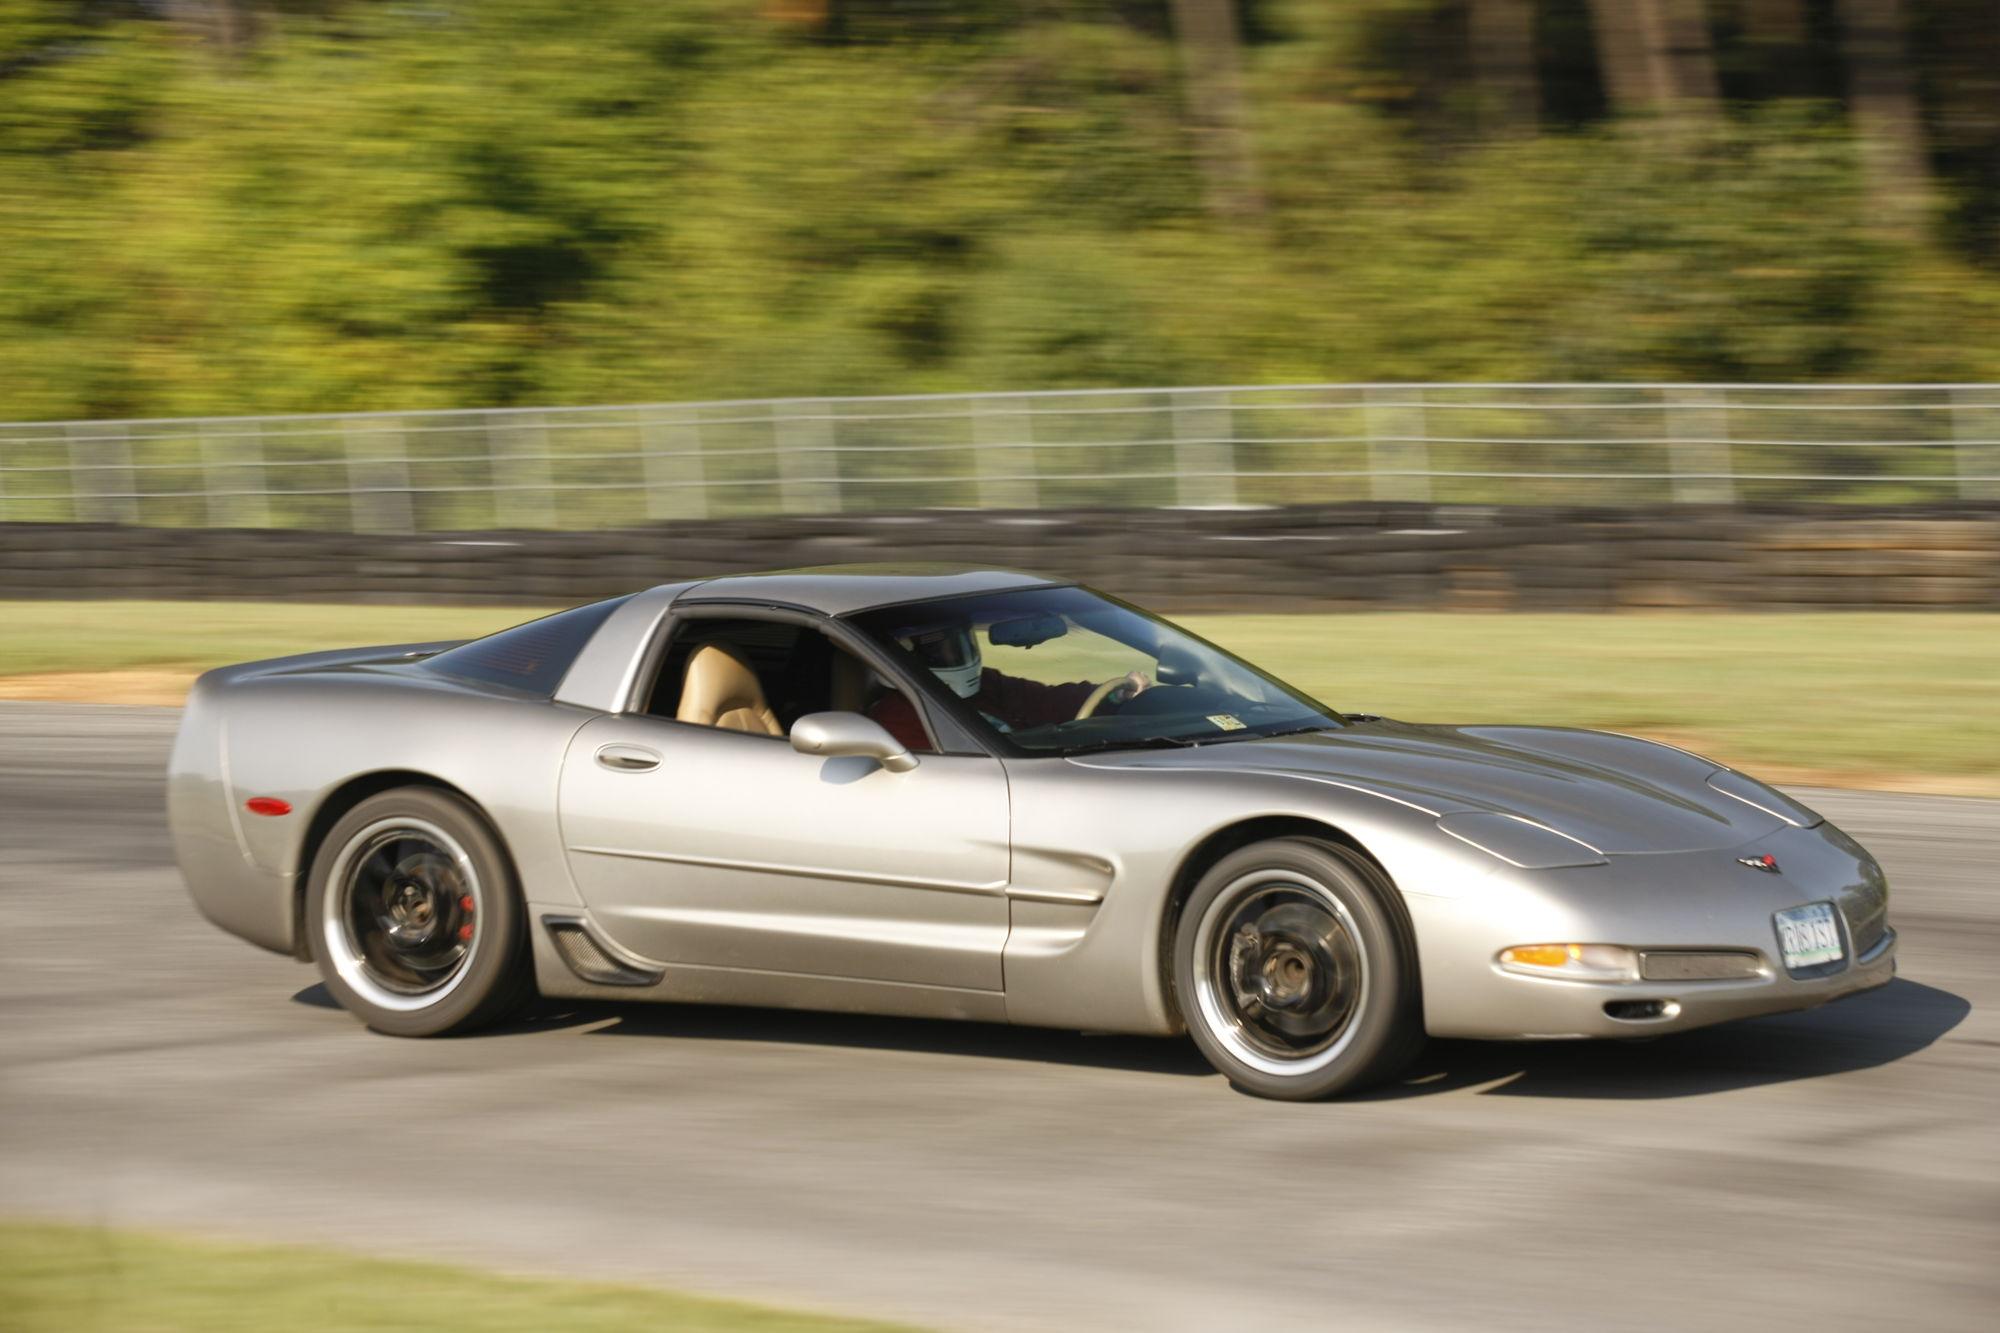 Harness Bar Seat Belt C5 Corvette C6 Corvette Racing